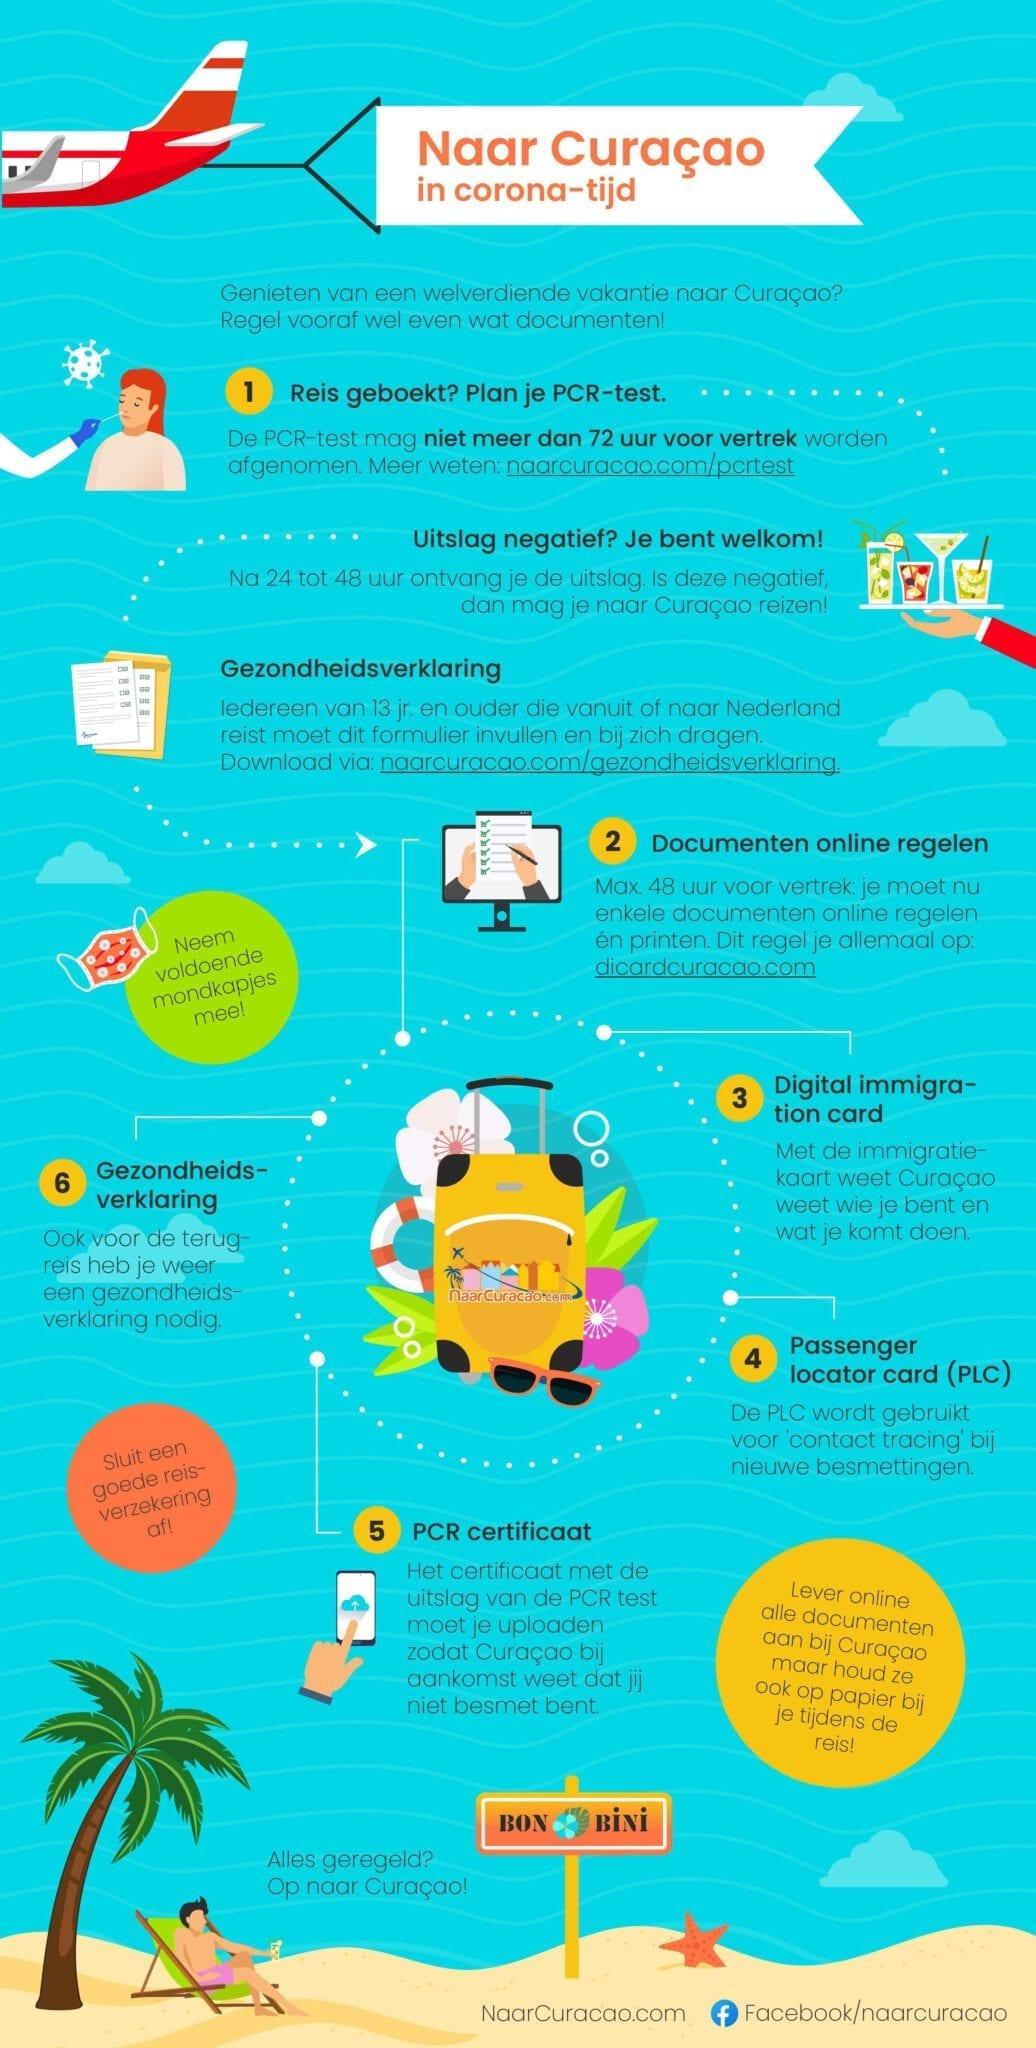 curacao corona infographic